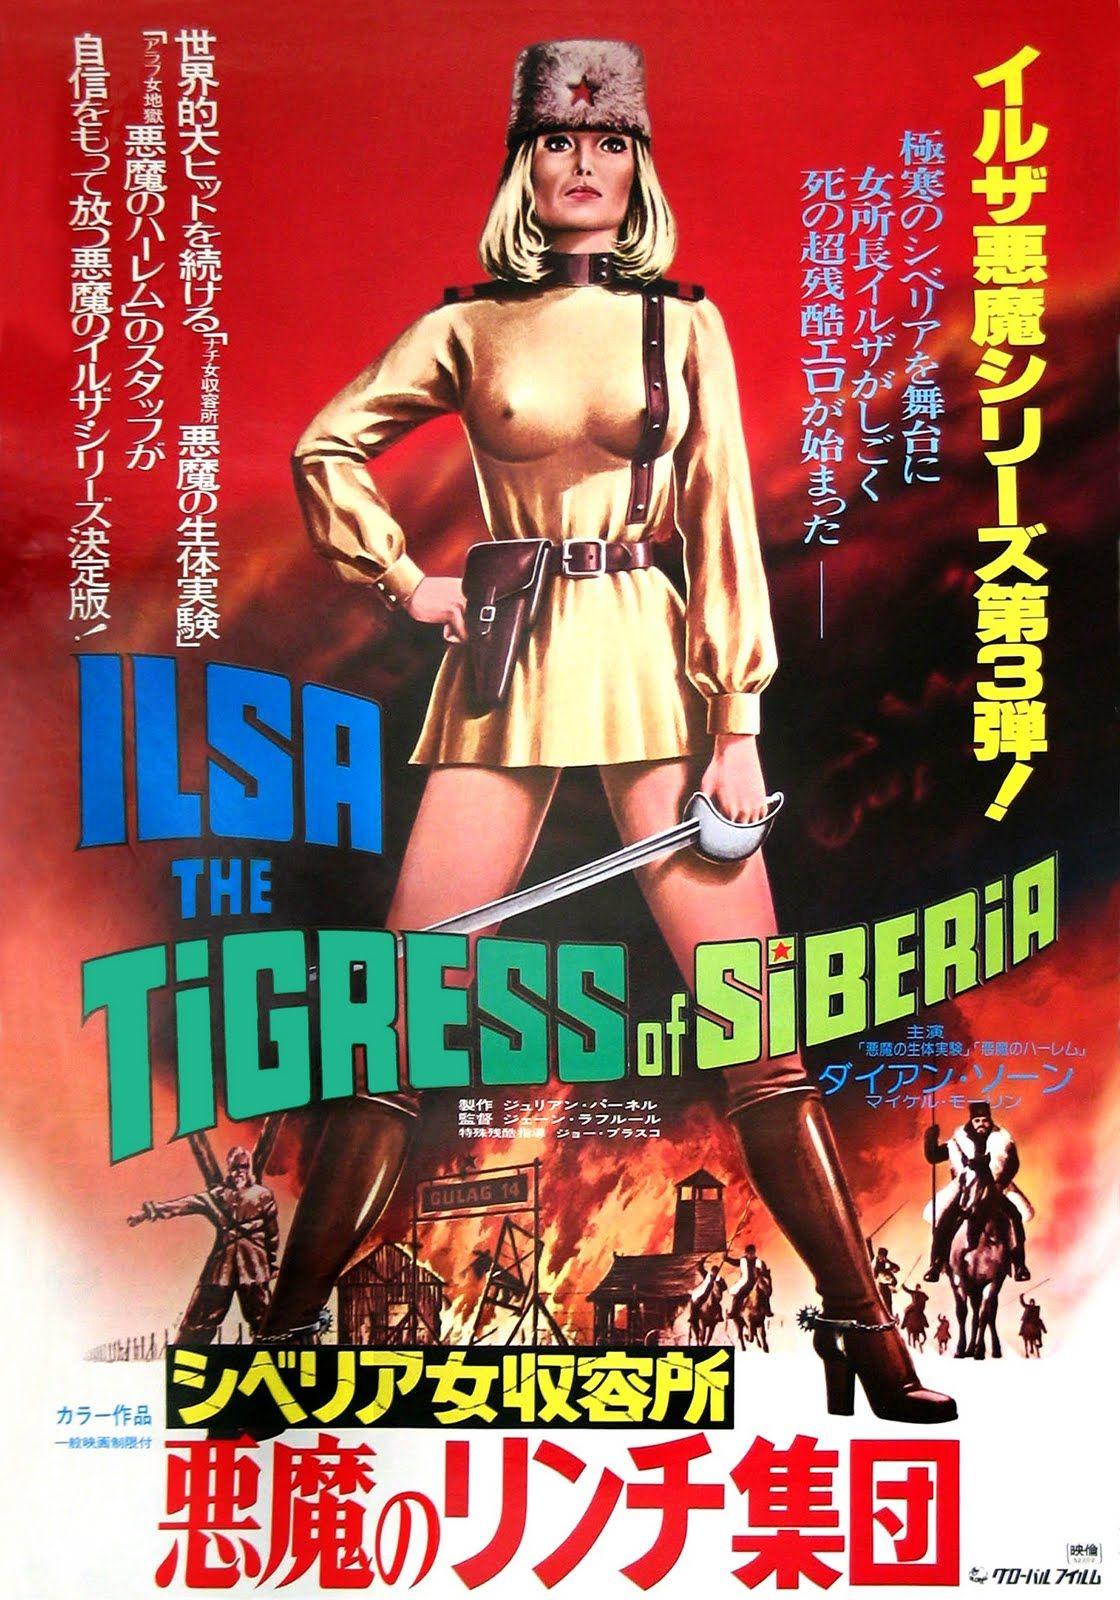 Ilsa the Tigress of Siberia starring Dyane Thorne, exploitation movie poster